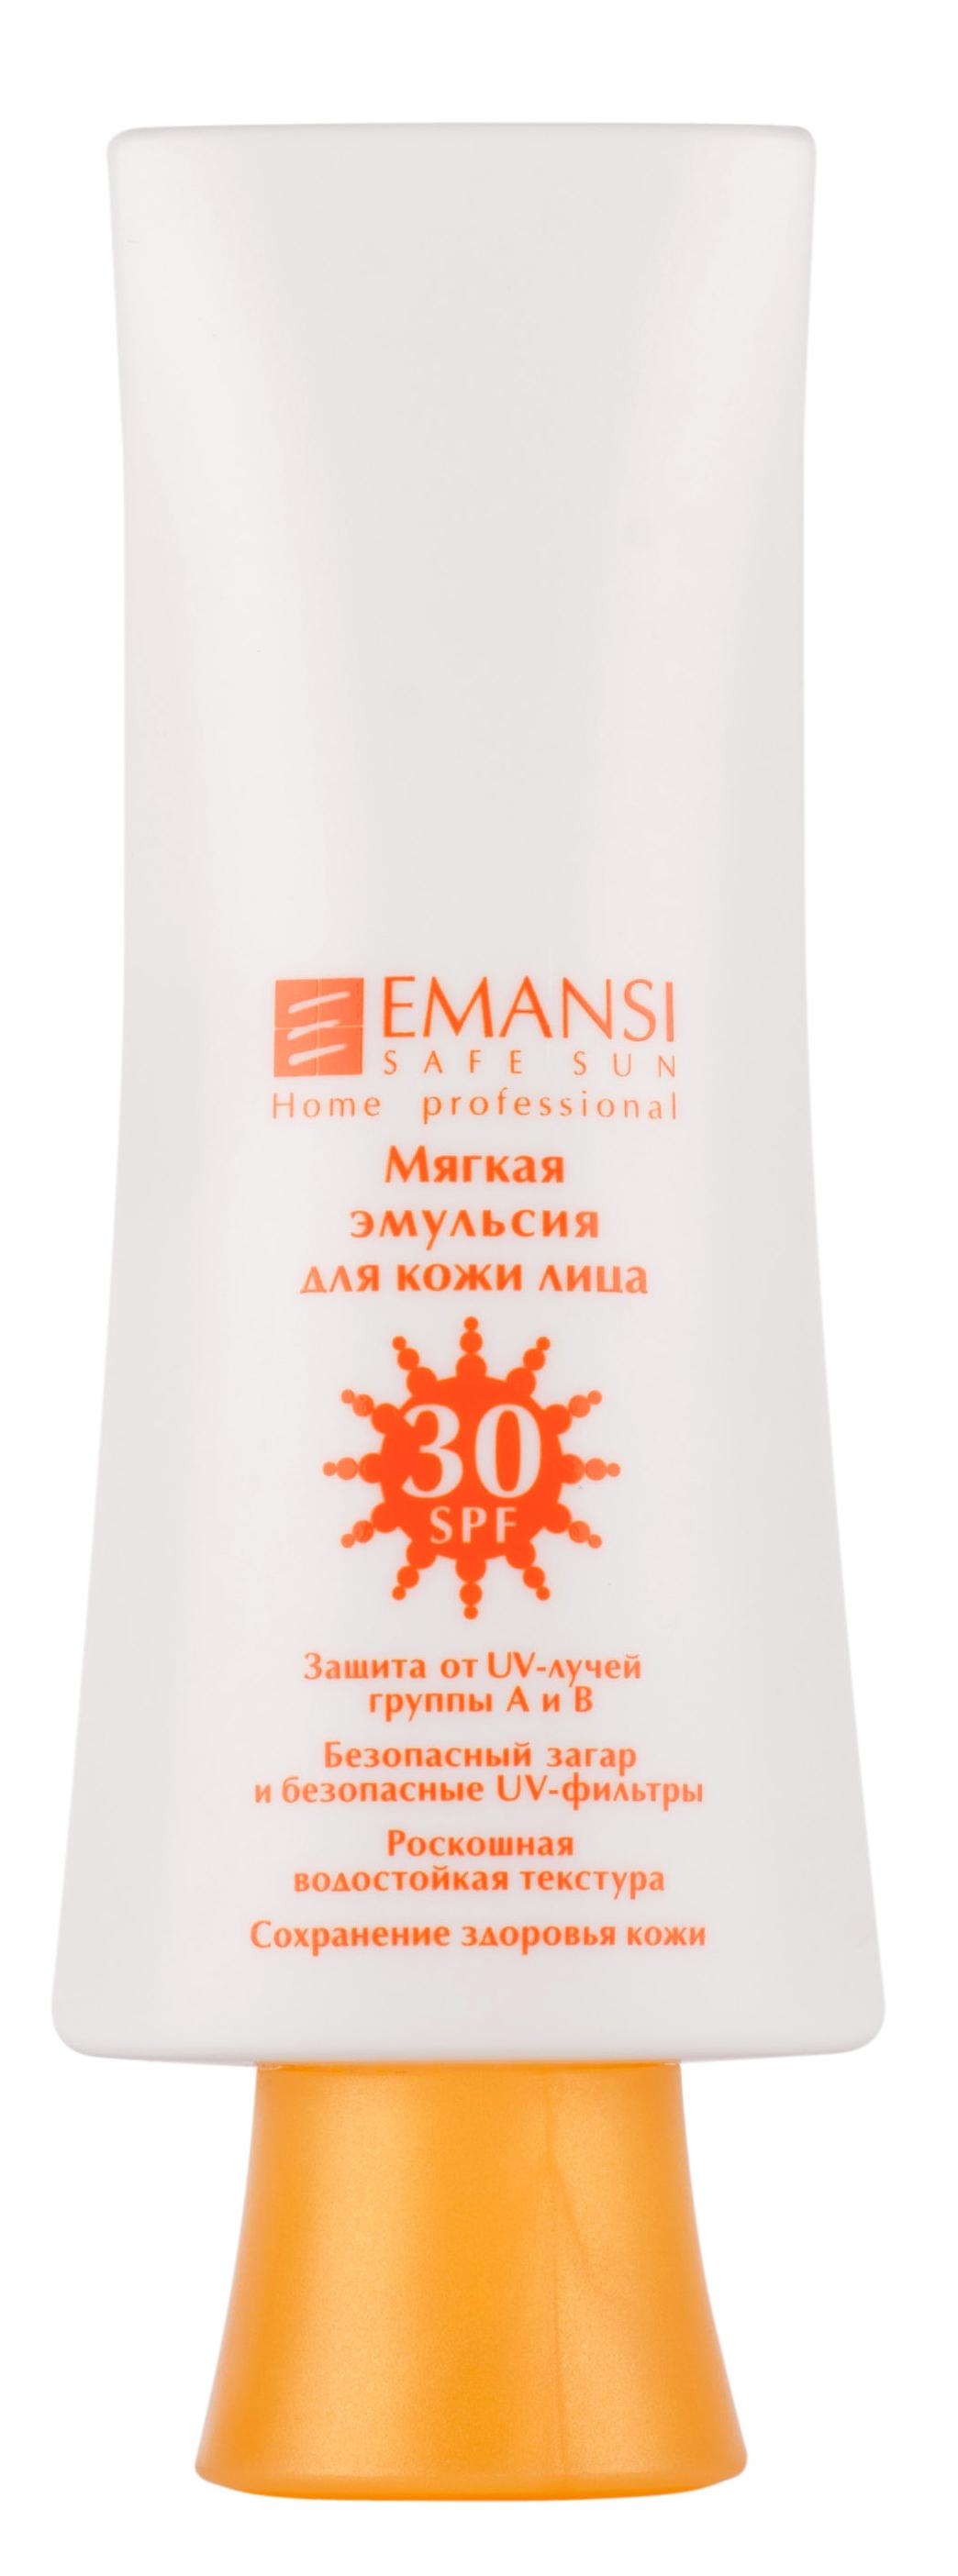 Emansi Мягкая эмульсия для кожи лица Safe sun SPF 30, 50 мл